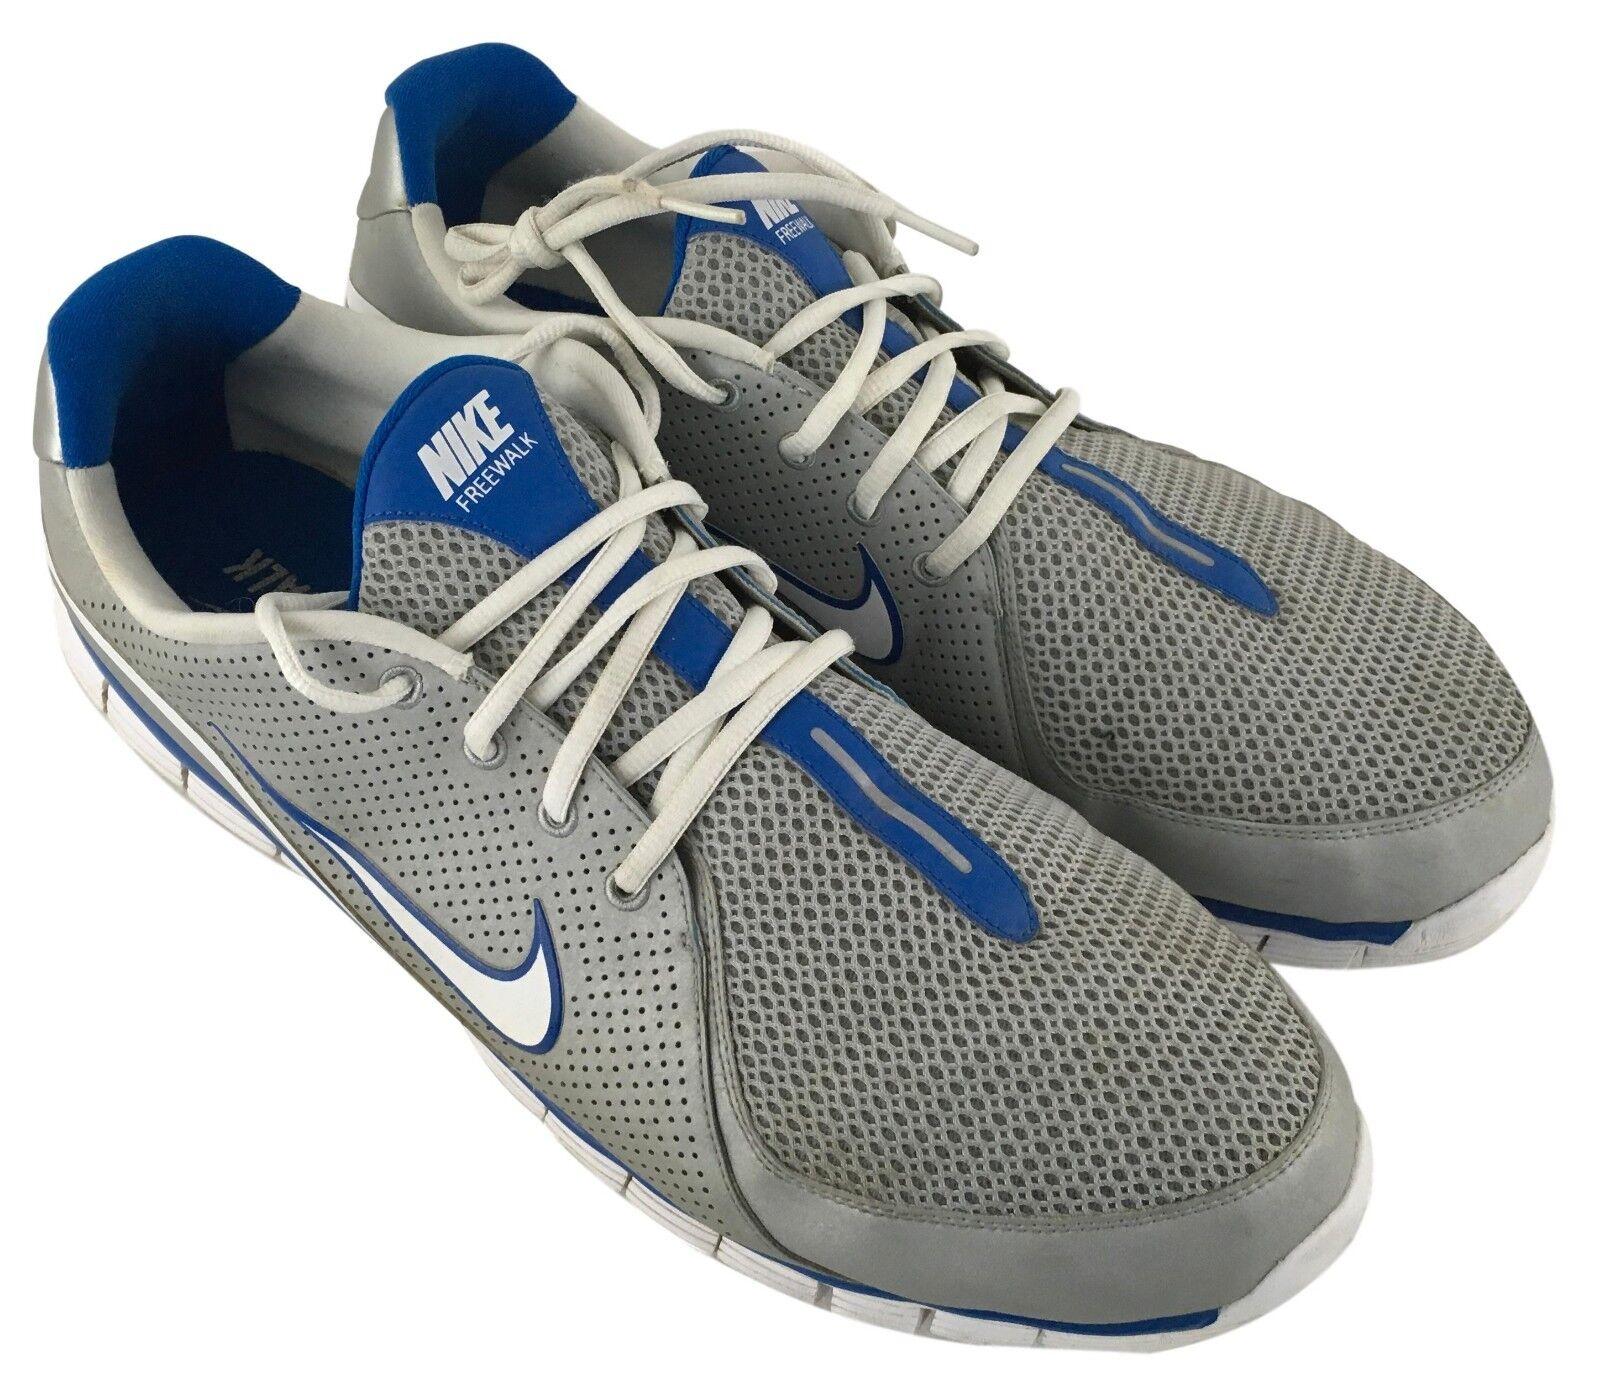 sneakers for cheap 3b813 58578 ... czech nike freewalk hombre gris azul blanco athletic training zapatillas  mas zapatos cómodos los zapatos mas ...